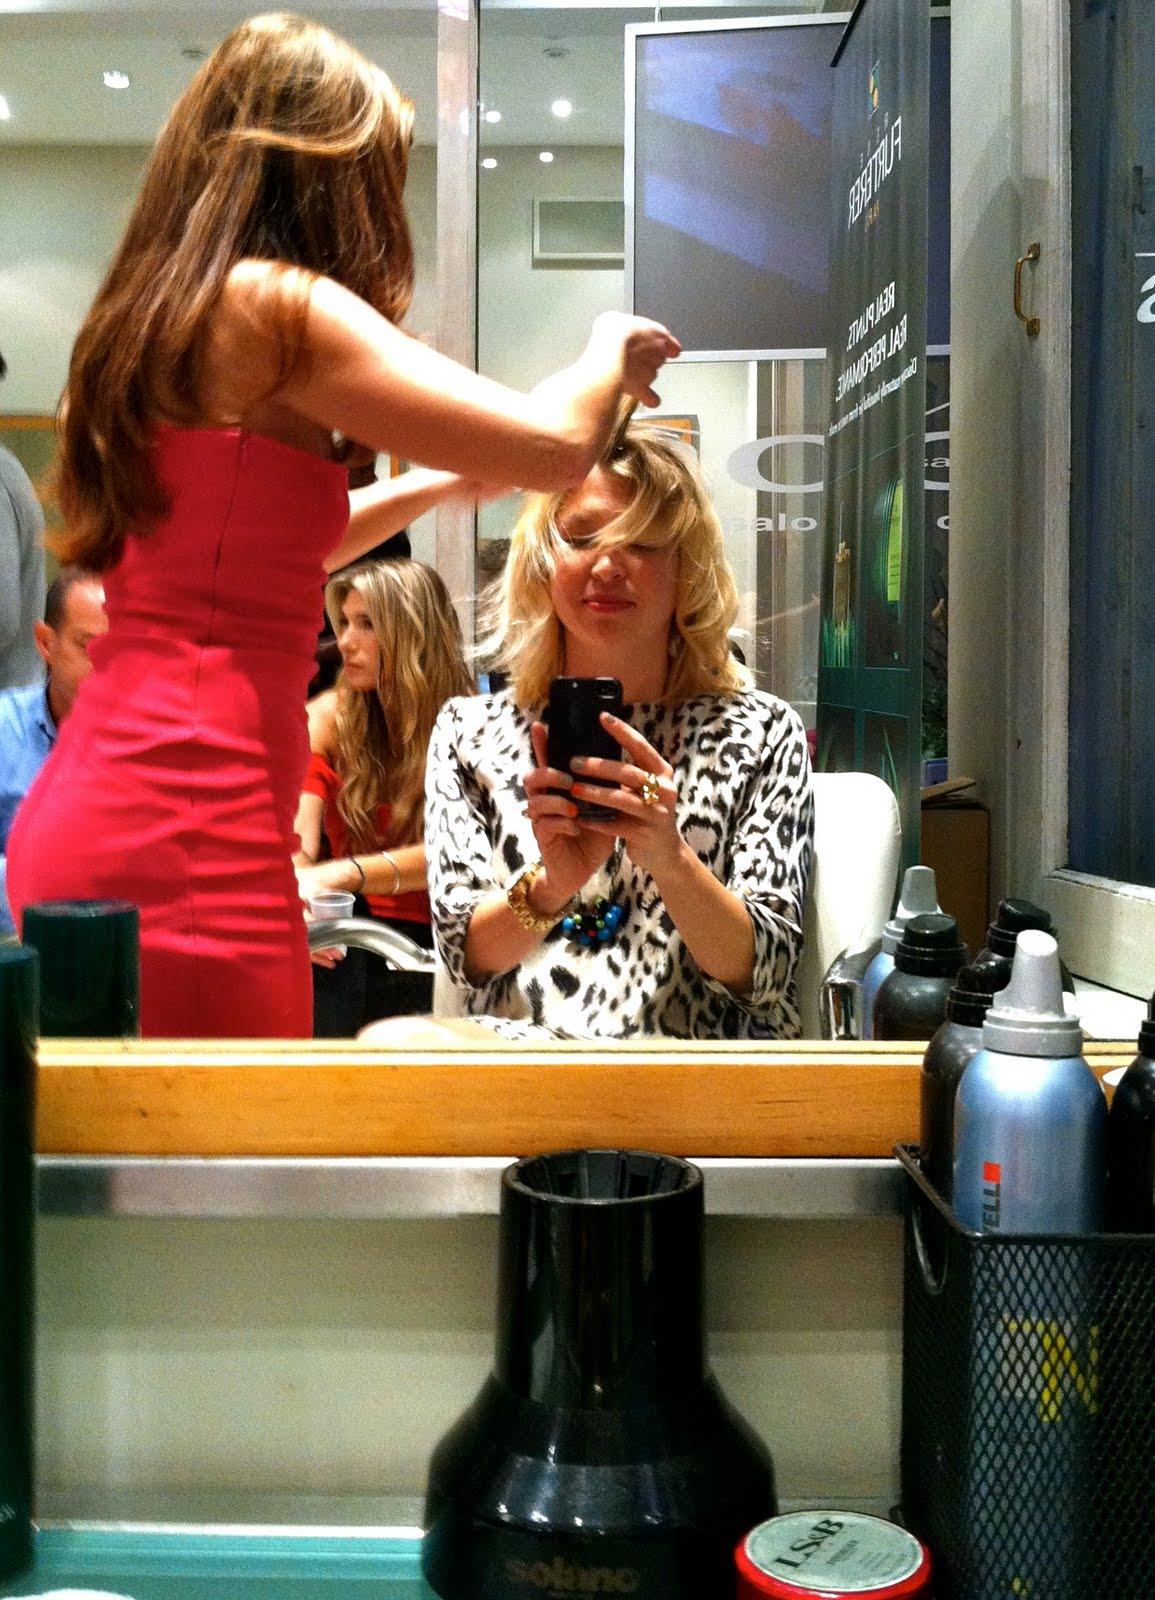 Style by salon acote the boston fashionista for Acote salon boston